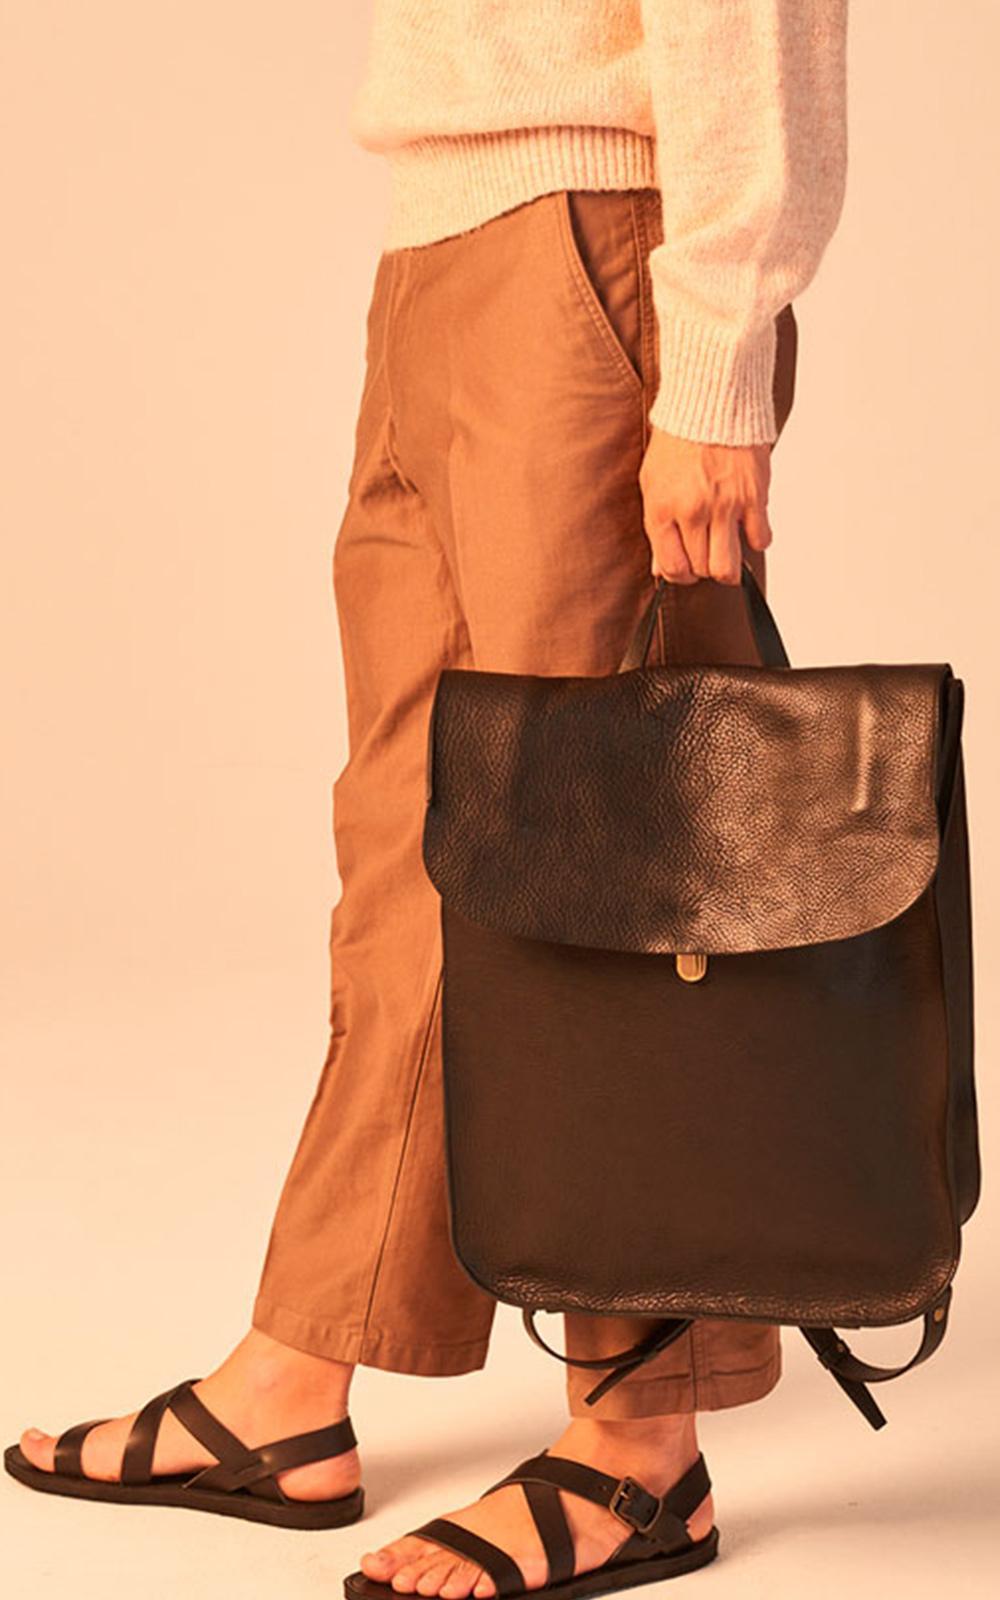 8e7d6c6042ca Bleu De Chauffe Arlo Leather Backpack Black in Black for Men - Lyst